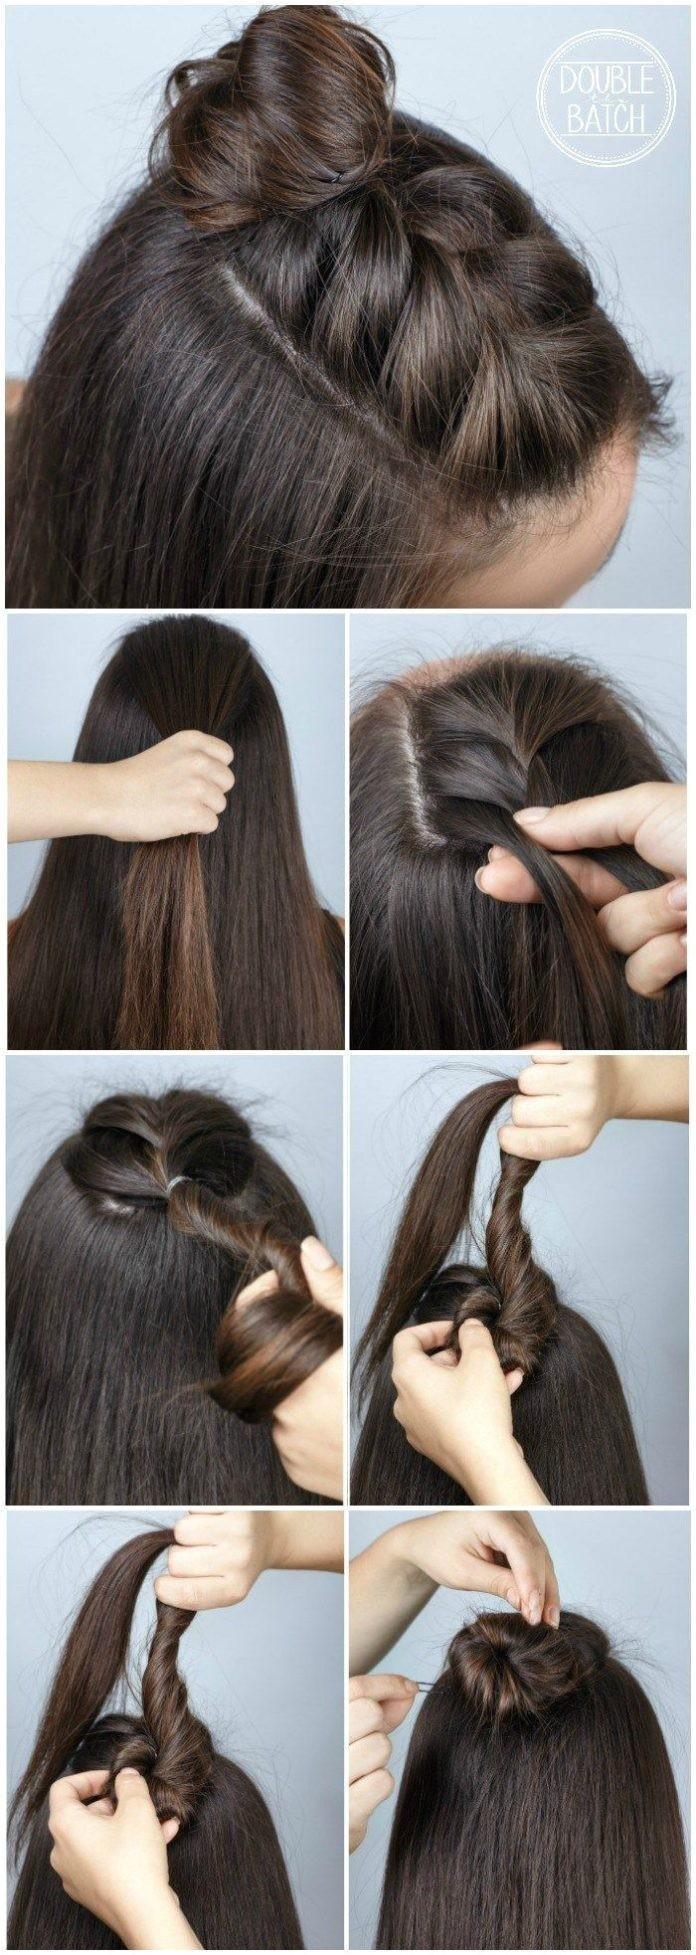 easy hair ideas for school braid bun